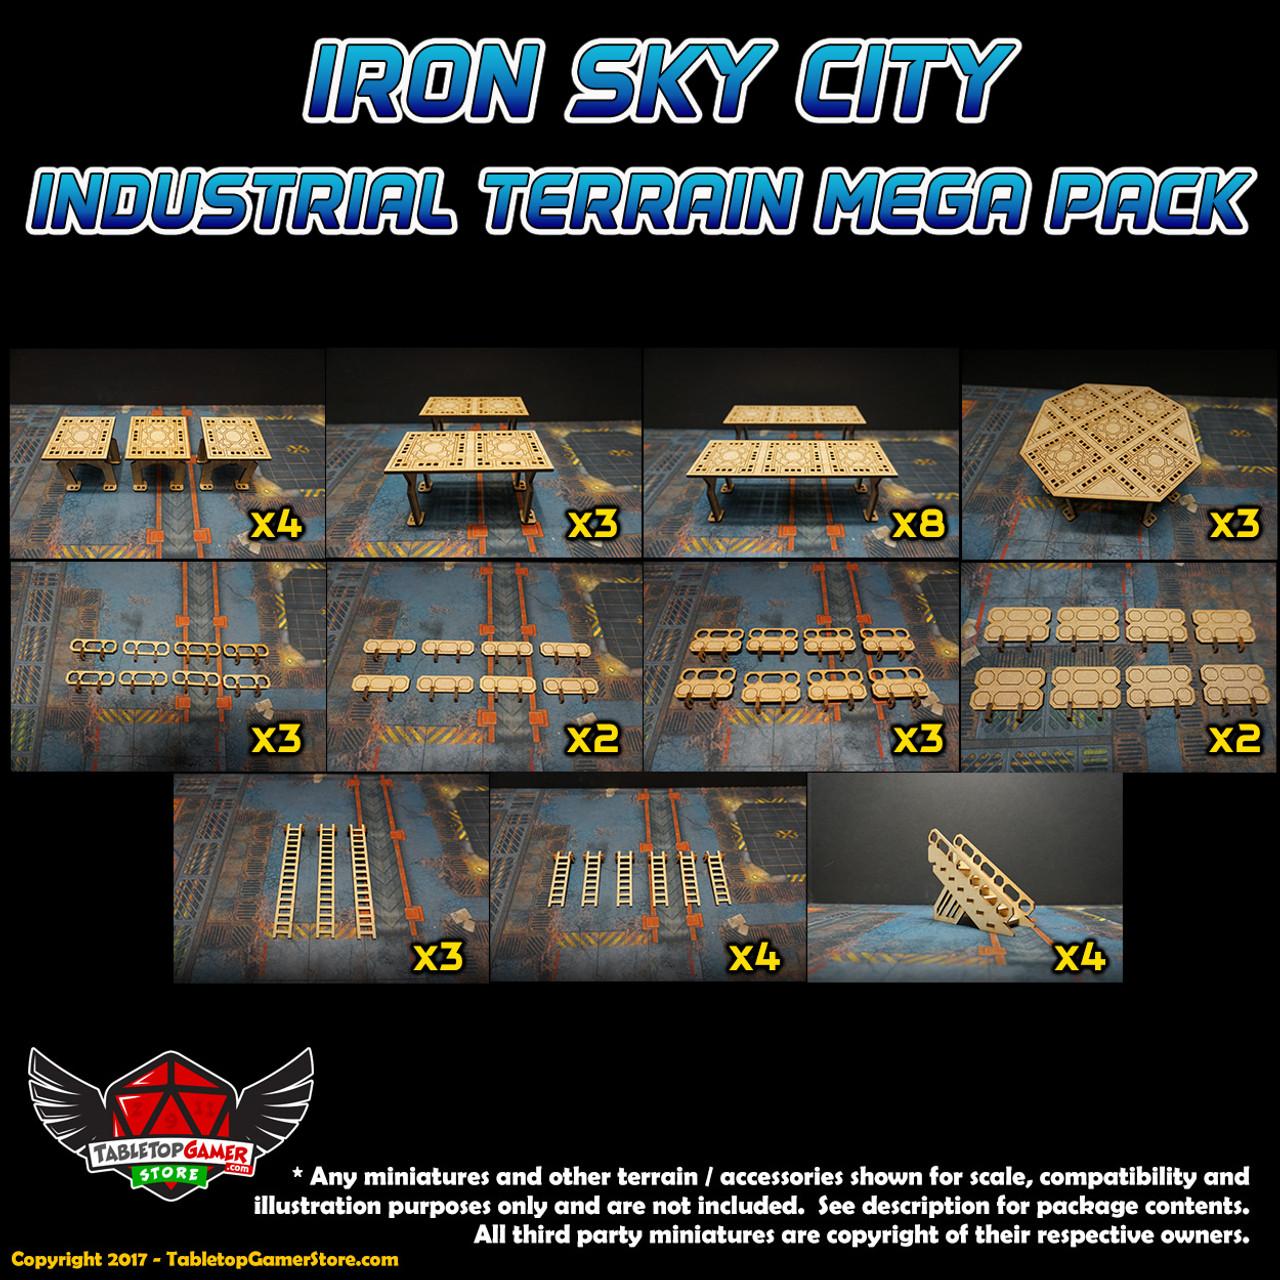 Iron Sky City Industrial Terrain Mega Pack